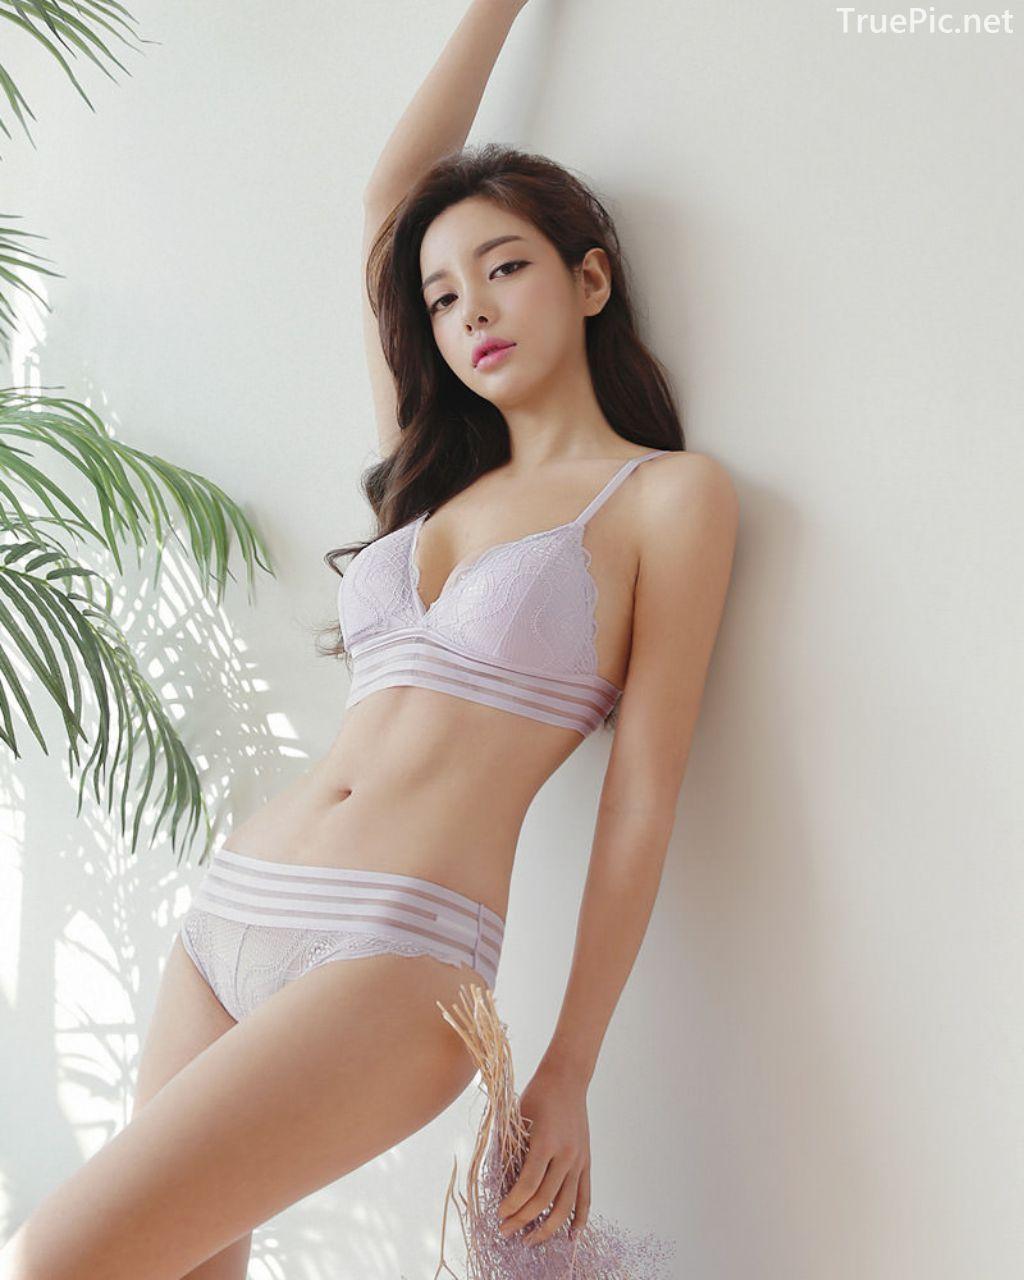 Jin Hee Korean Fashion Model - Love Me Lingerie Collection - TruePic.net - Picture 1